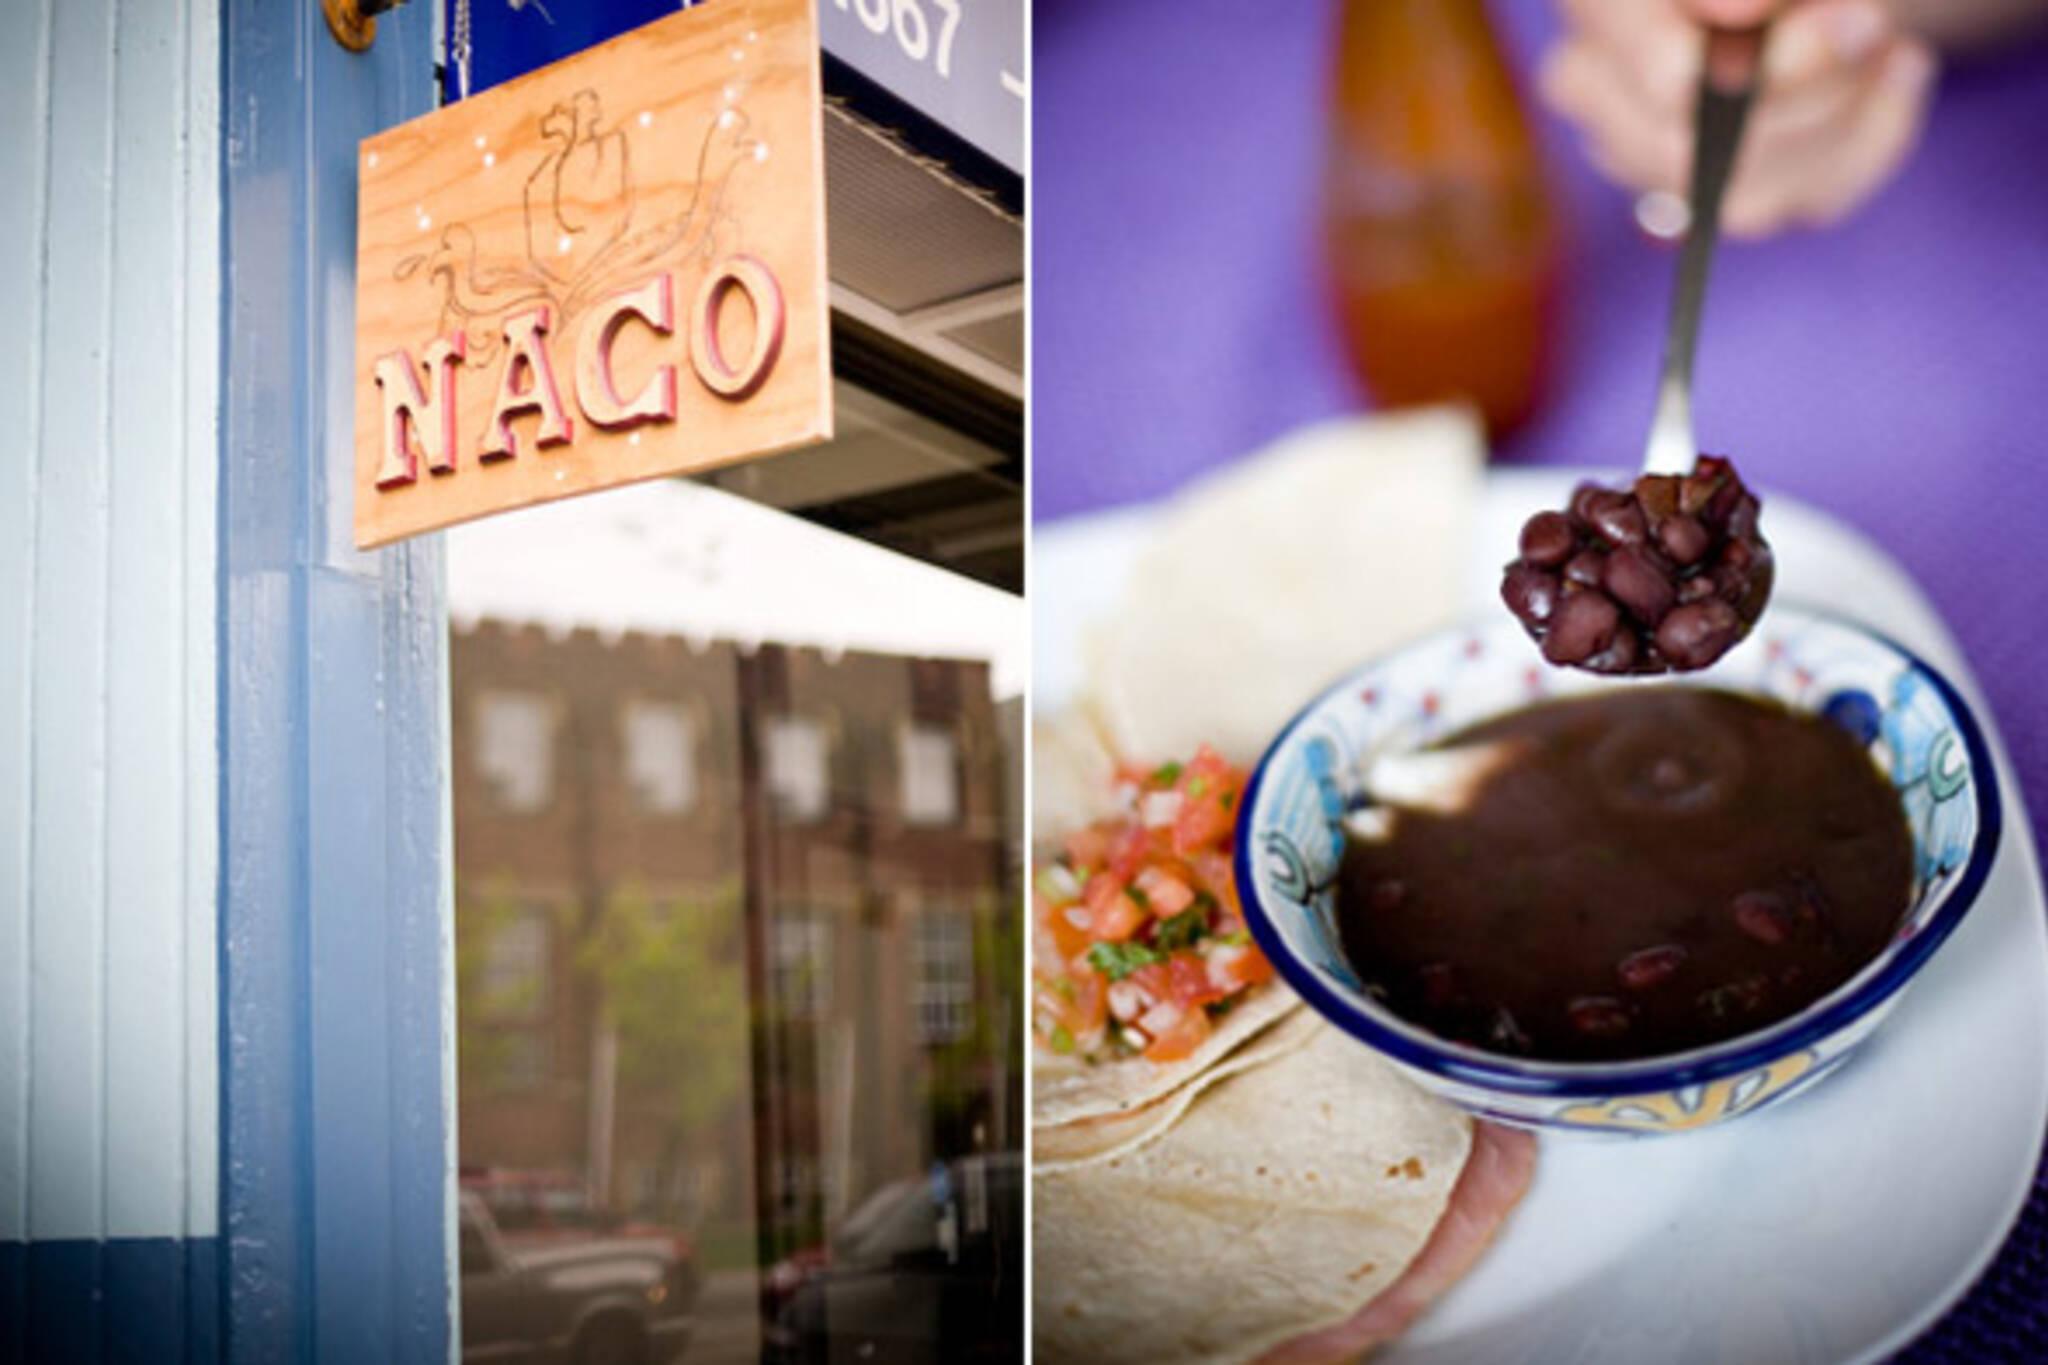 naco gallery cafe toronto